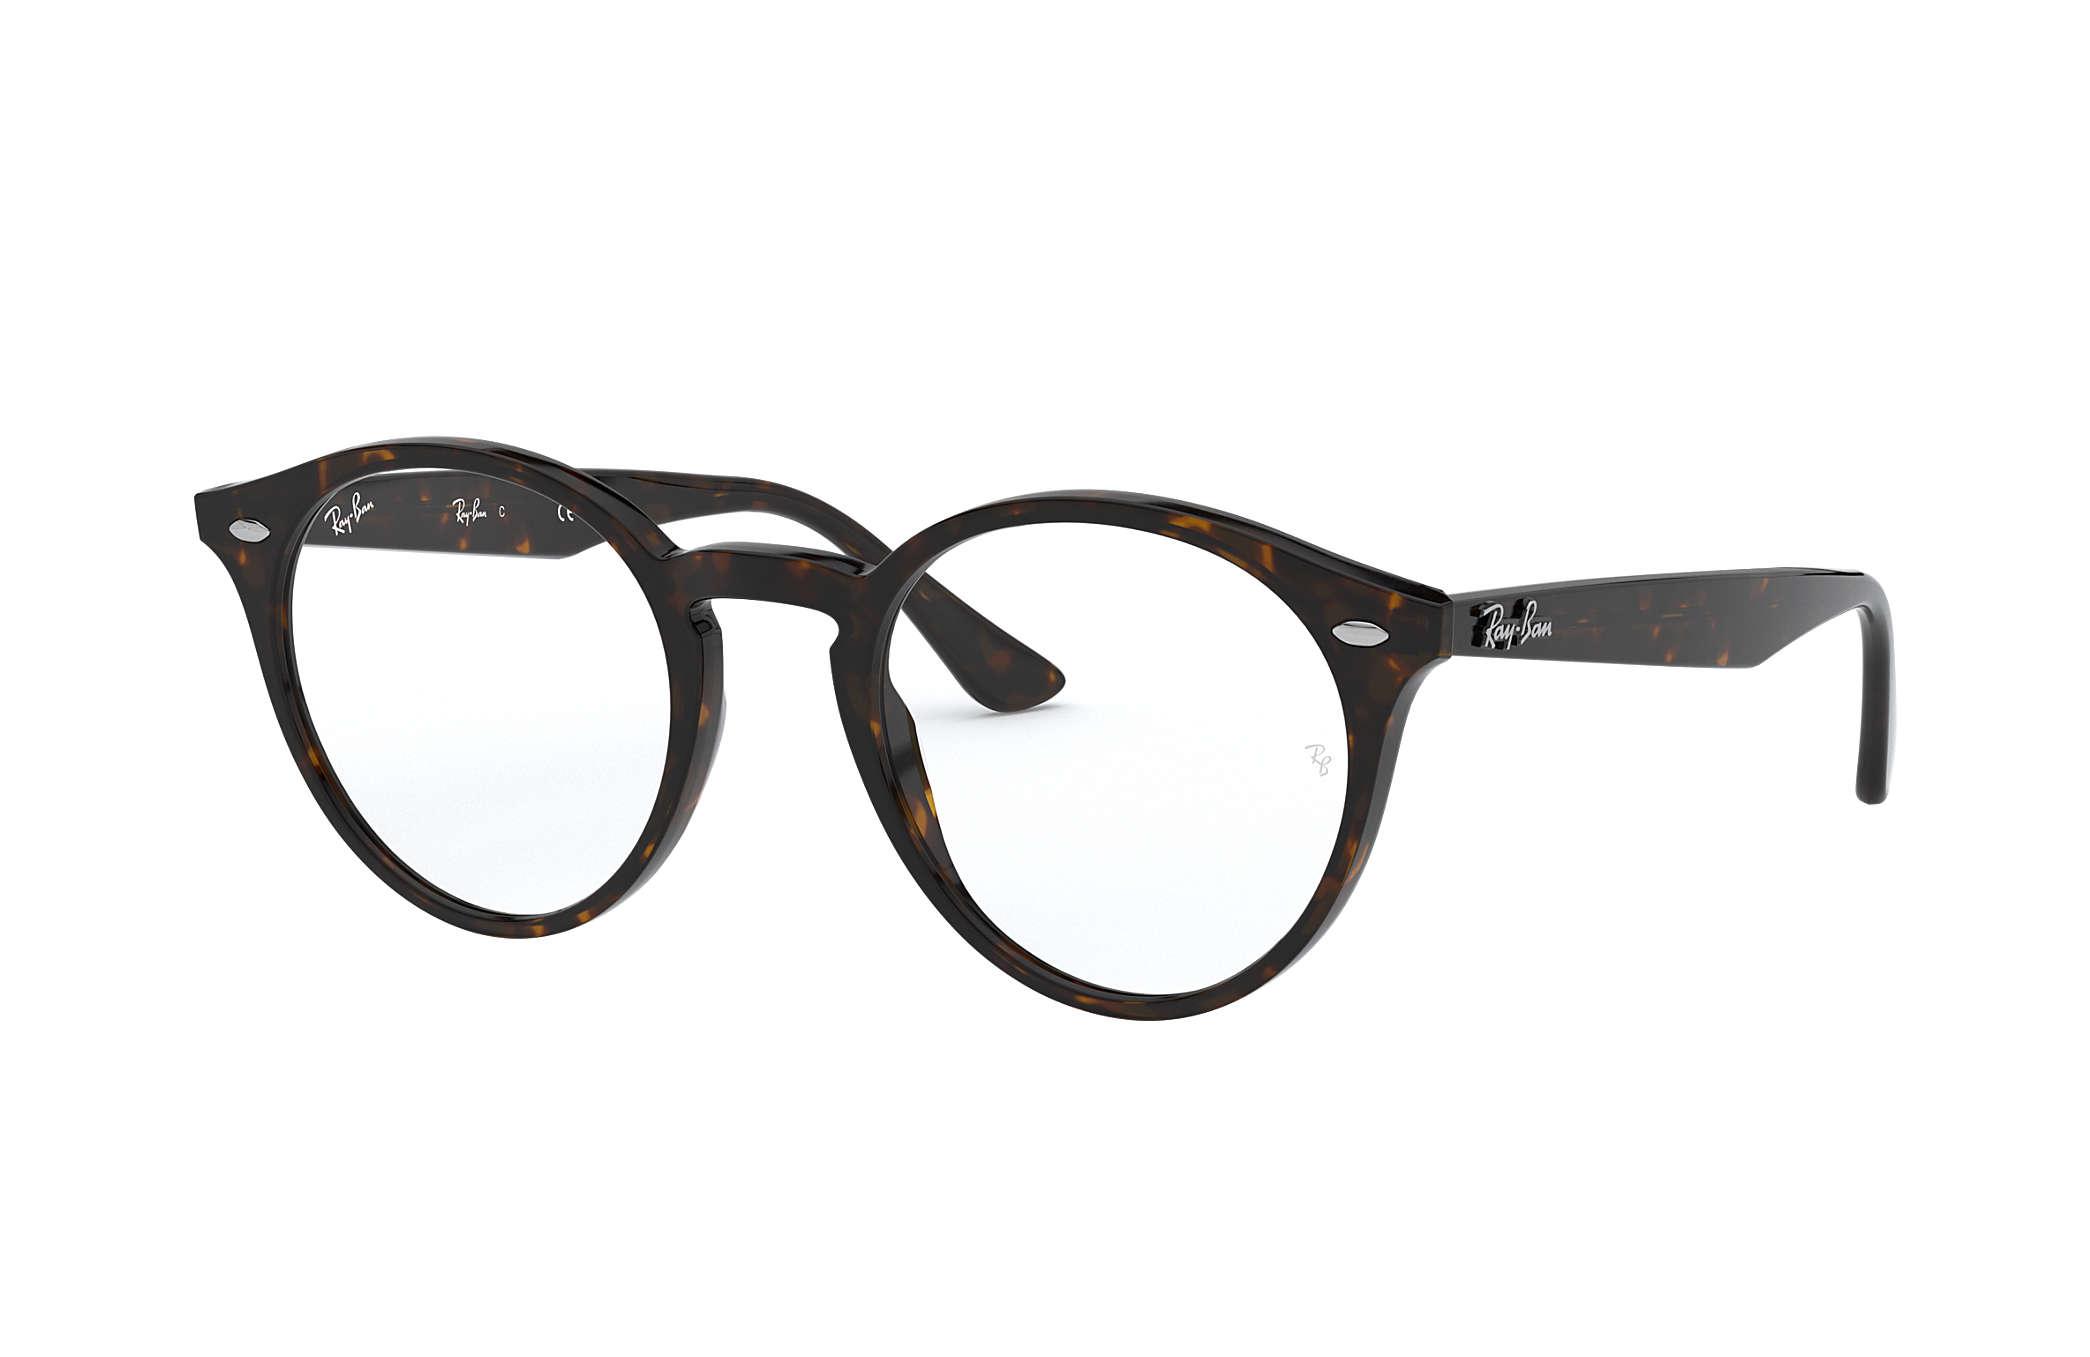 4e9f9ddde Óculos de grau Ray-Ban RB2180V Tartaruga - Acetato - 0RX2180V201249 ...